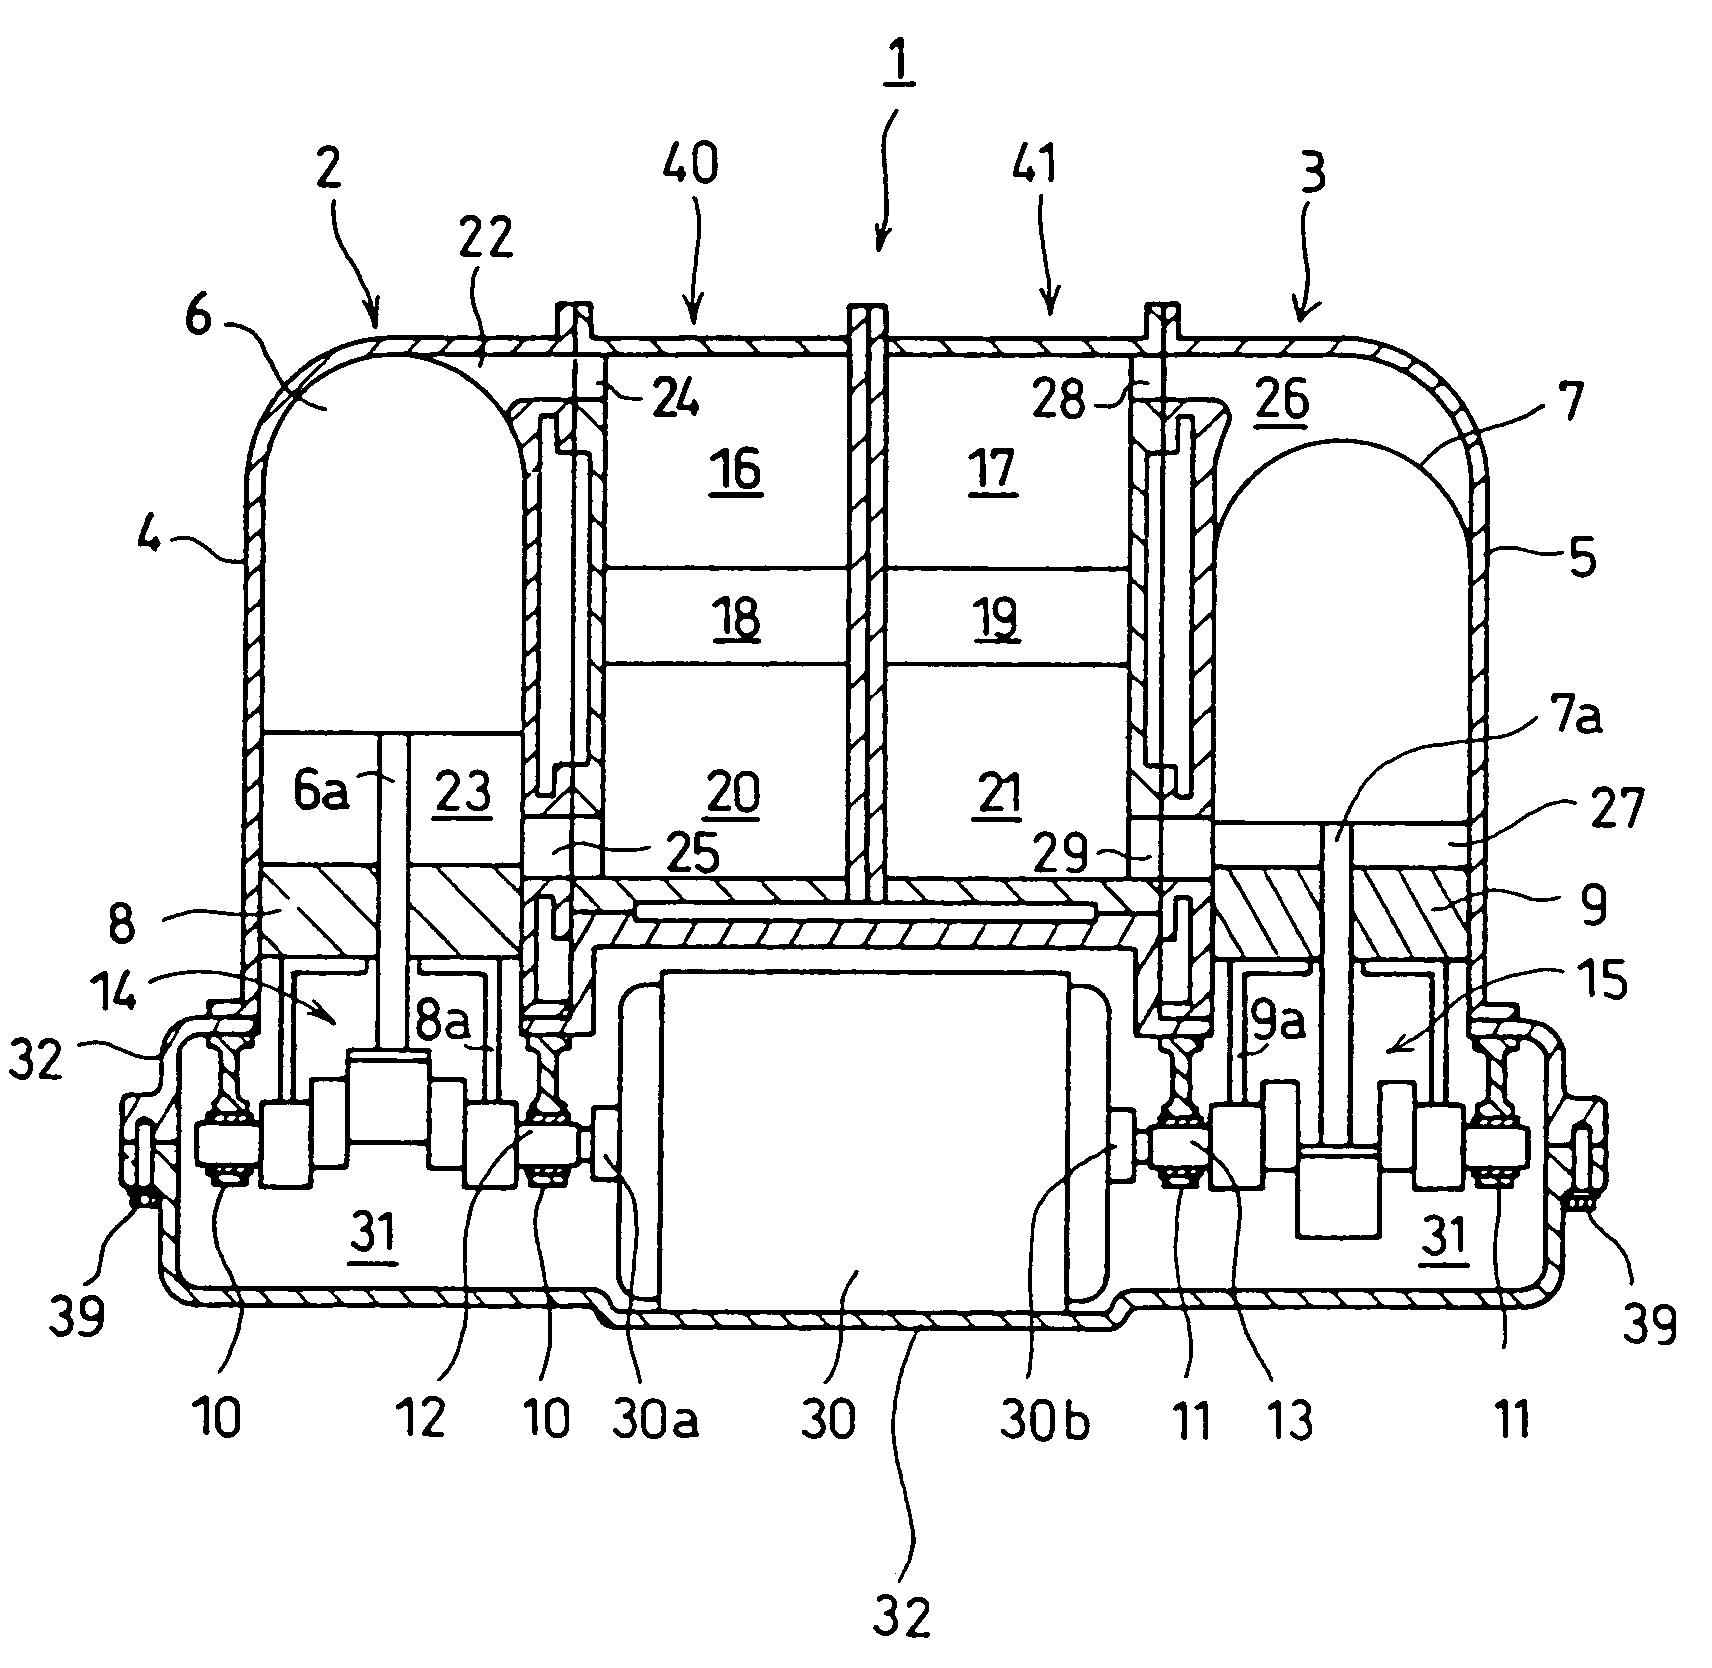 medium resolution of multistage stirling engine us 7484366 b2 patent drawing